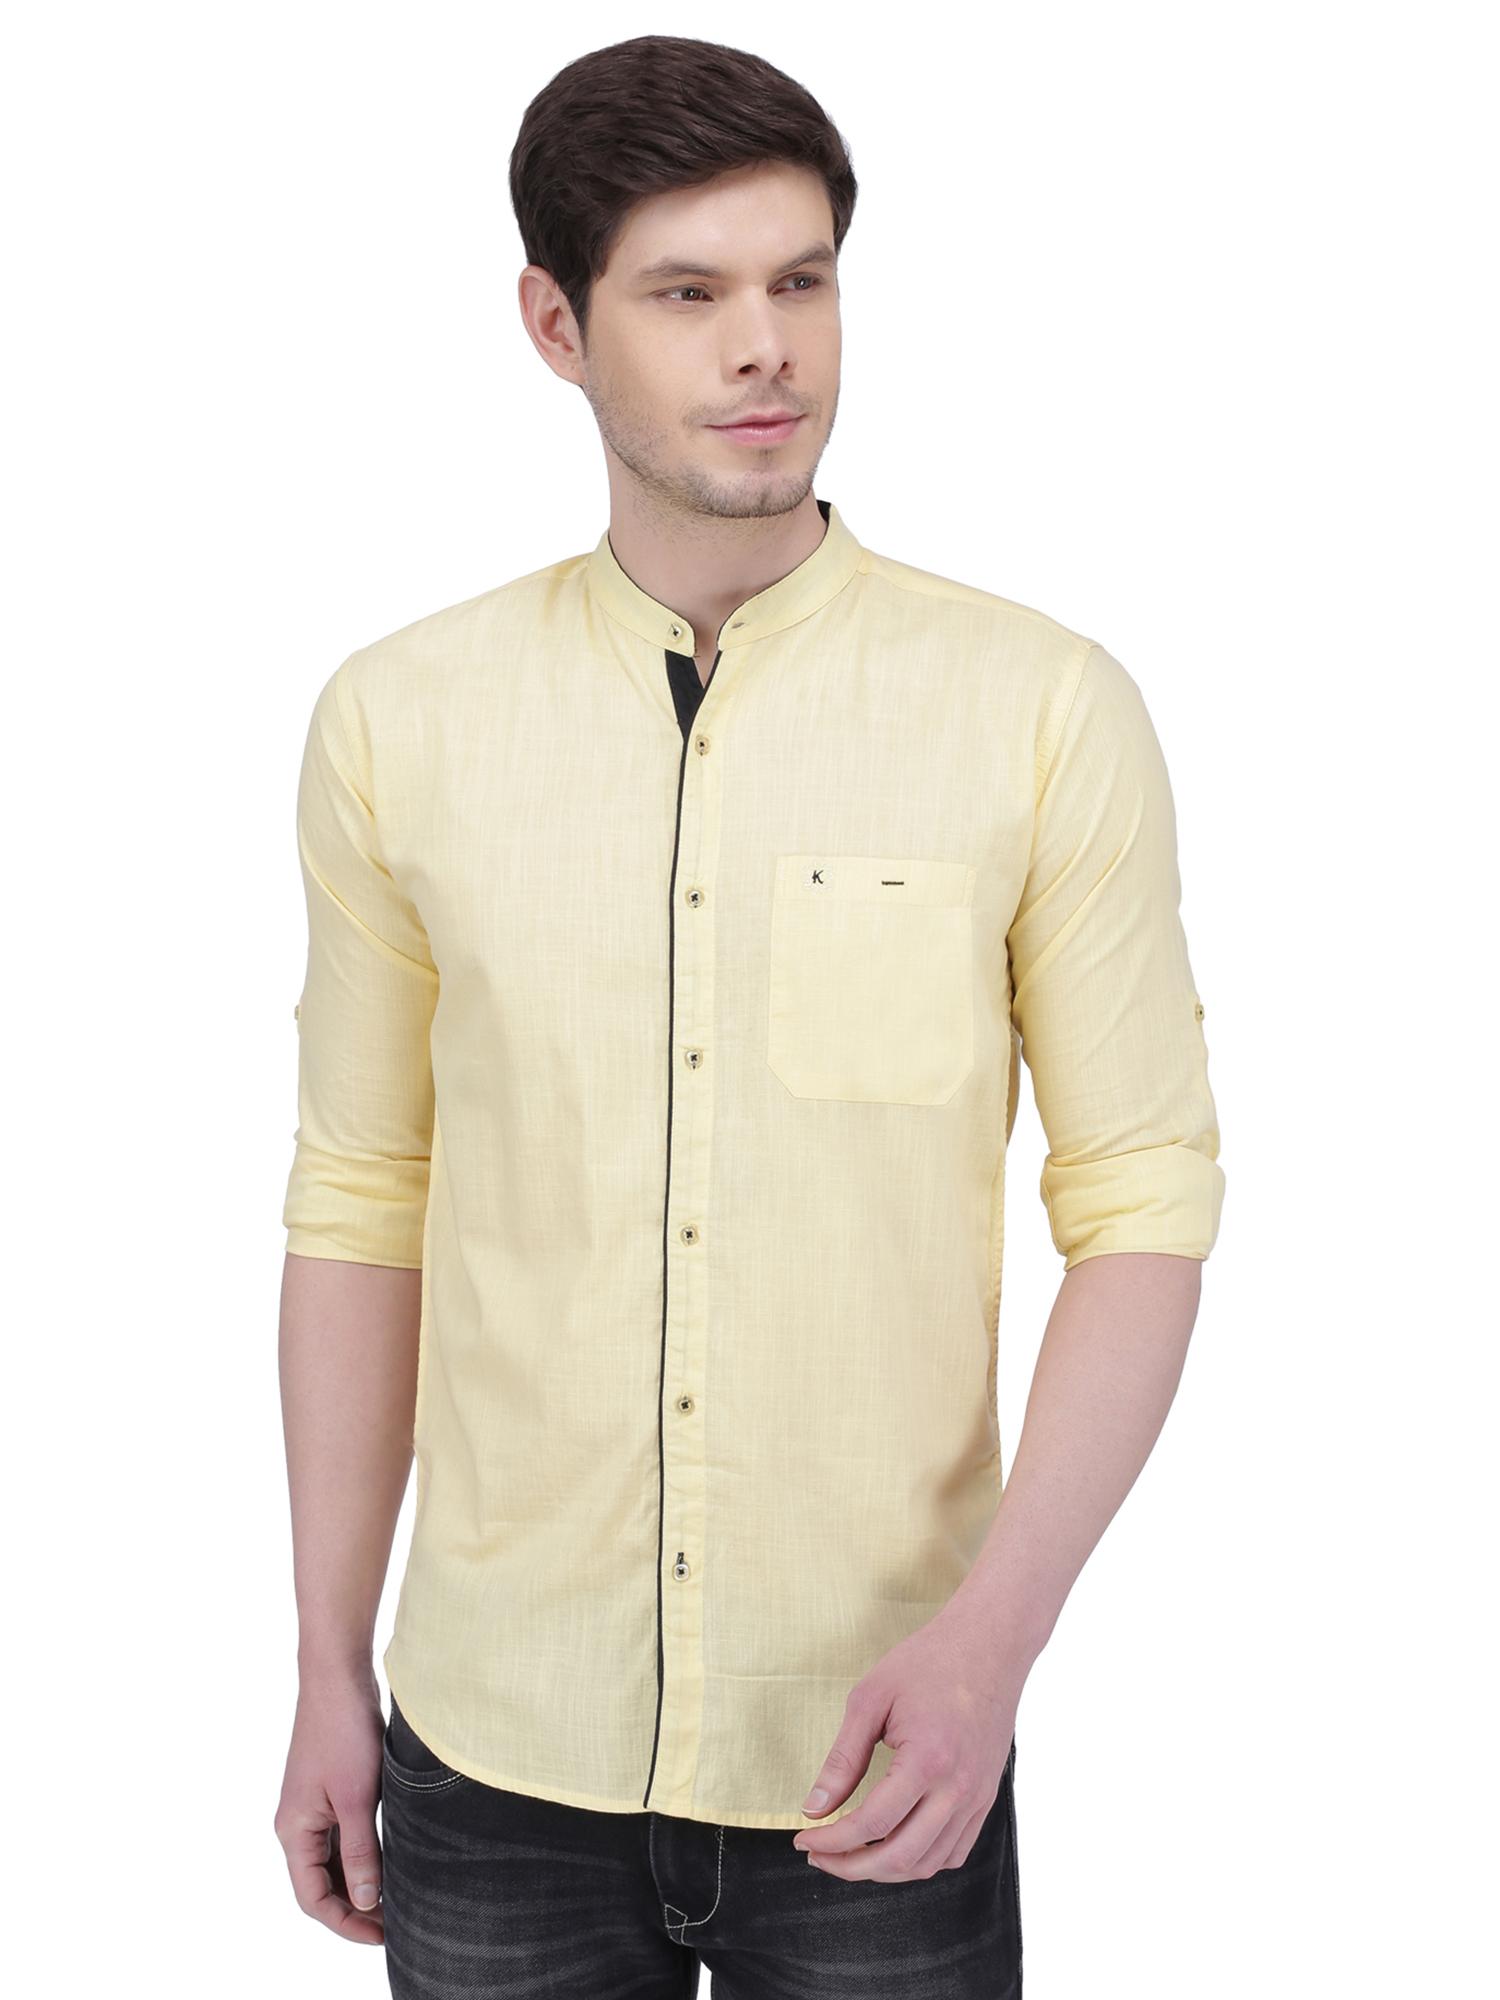 Kuons Avenue Men's Cream Yellow Linen Cotton Casual Shirt- KACLFS1296YL